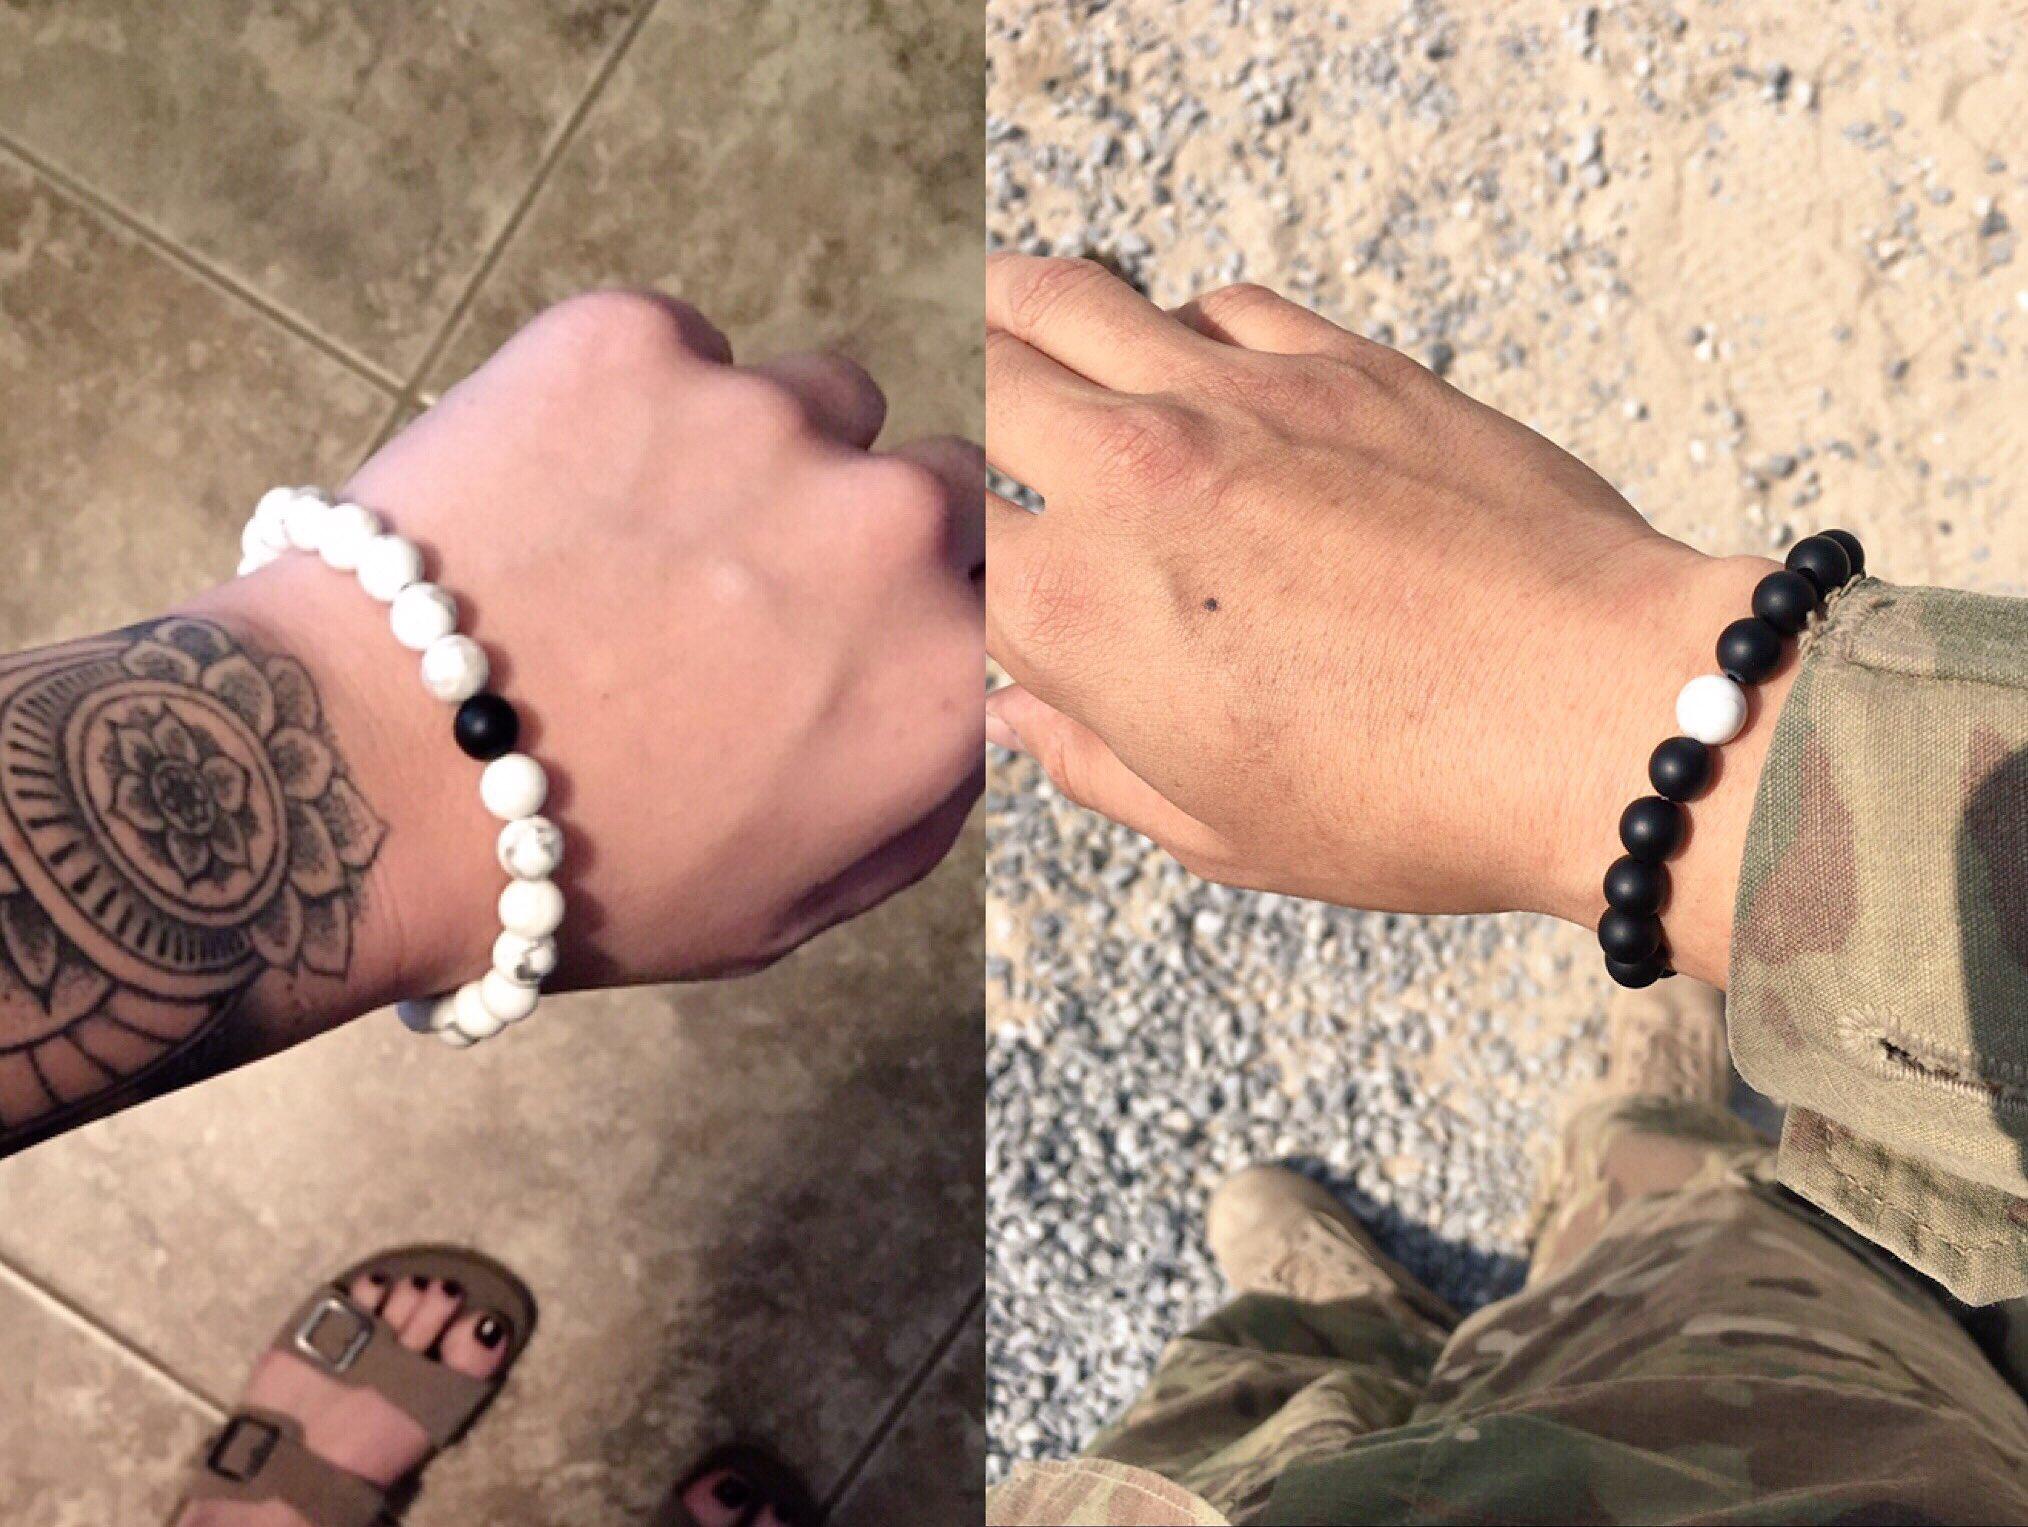 'Distance Bracelets keep you connected no matter the Distance' ��❤️ https://t.co/umKAdwWYVt https://t.co/o8kciERsjB